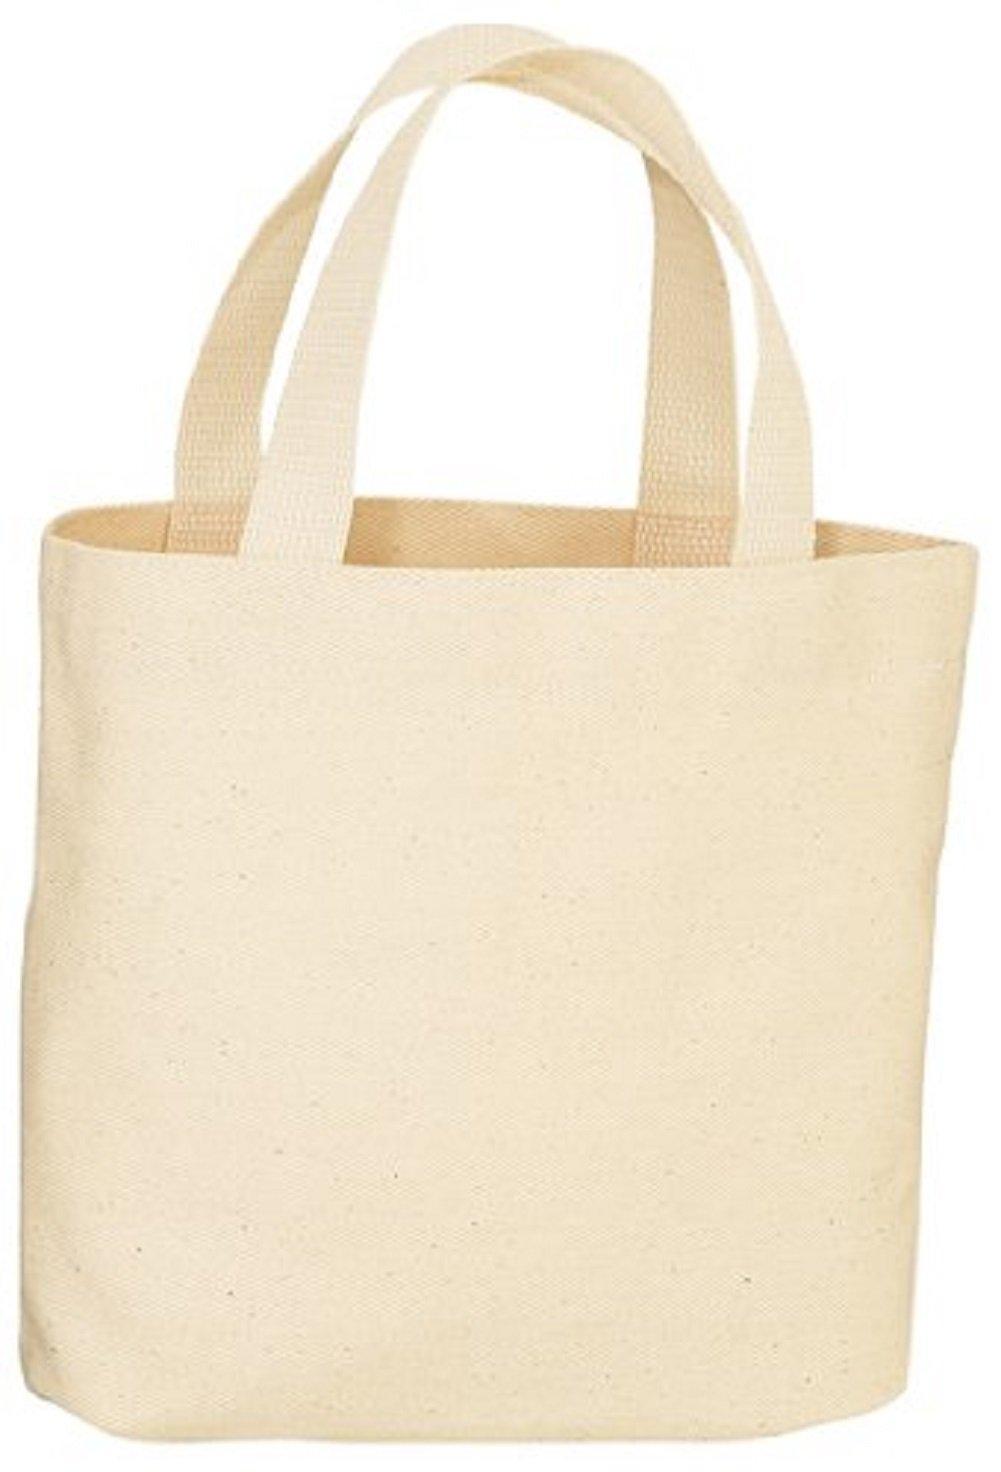 Canvas Bag Craft Ideas